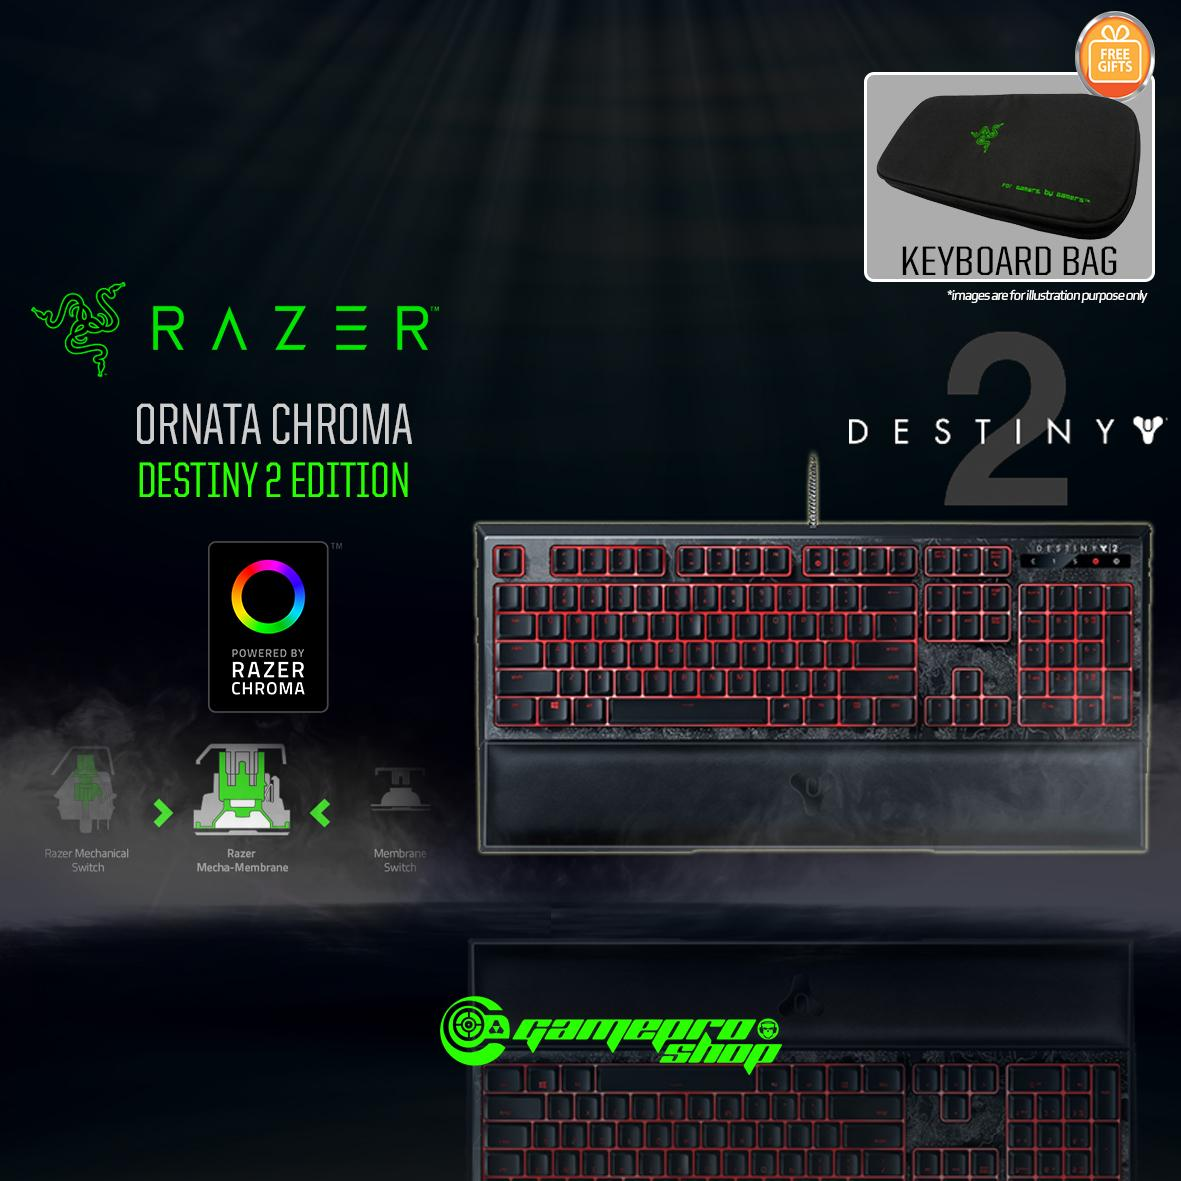 Destiny 2 Razer Ornata Chroma - Multi-color Membrane Gaming Keyboard *COMEX  PROMO*